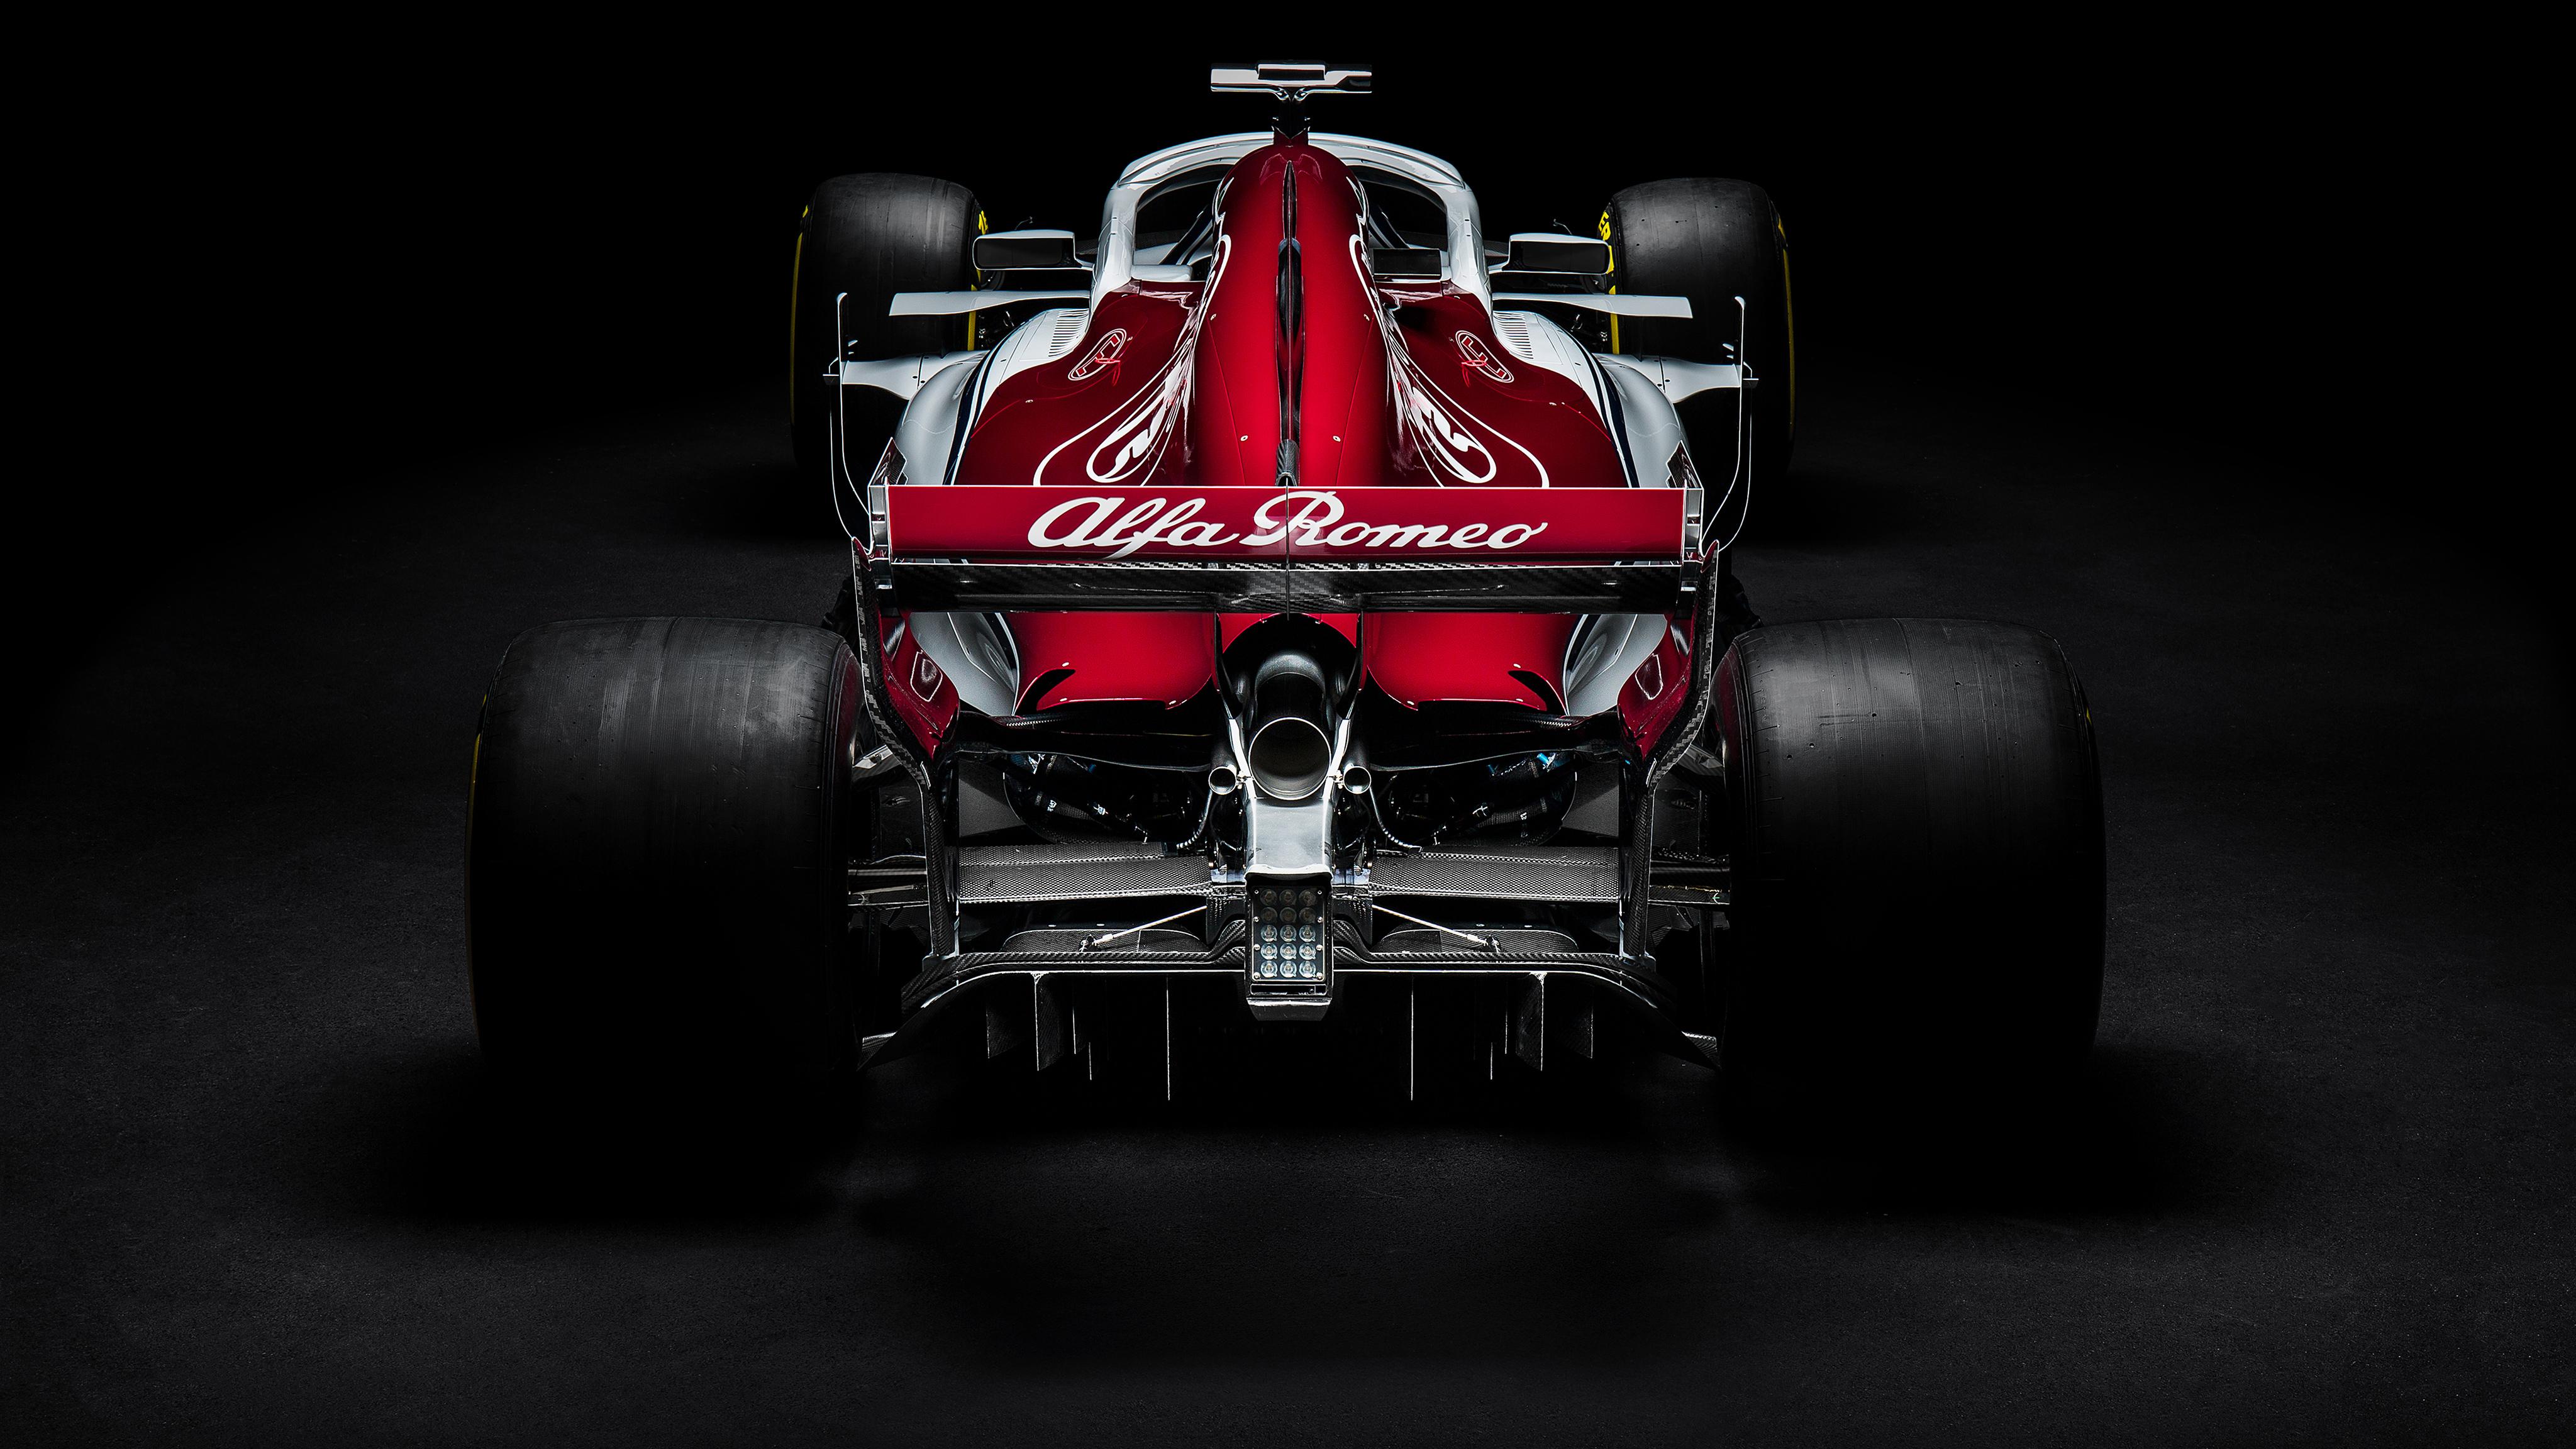 2018 Sauber C37 F1 Formula 1 Car 4k Wallpaper Hd Car Wallpapers Id 9634